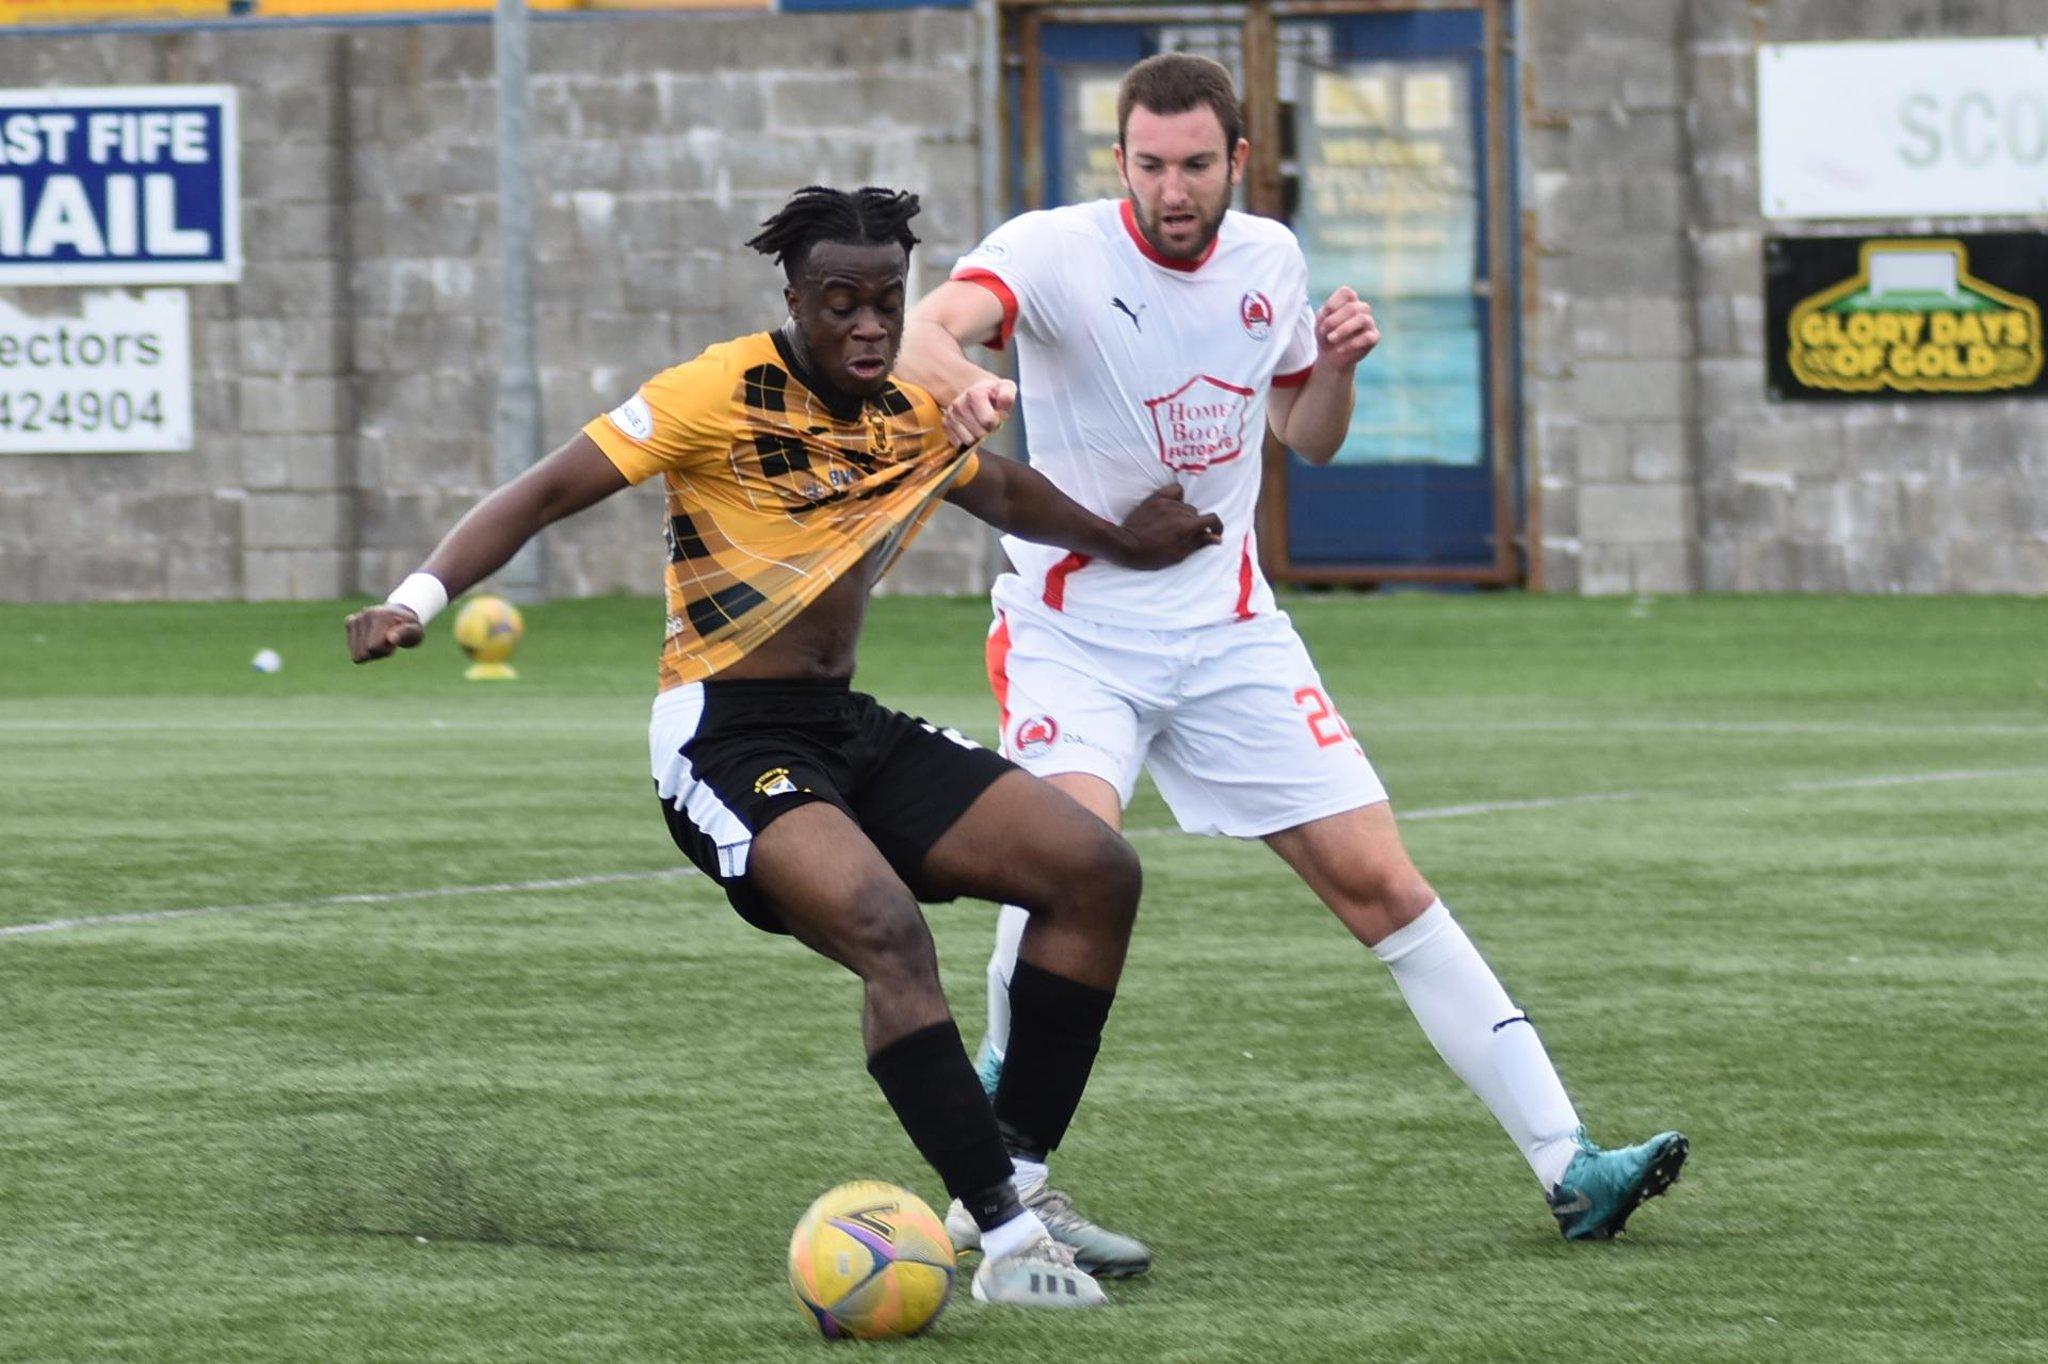 East Fife 0-2 Clyde